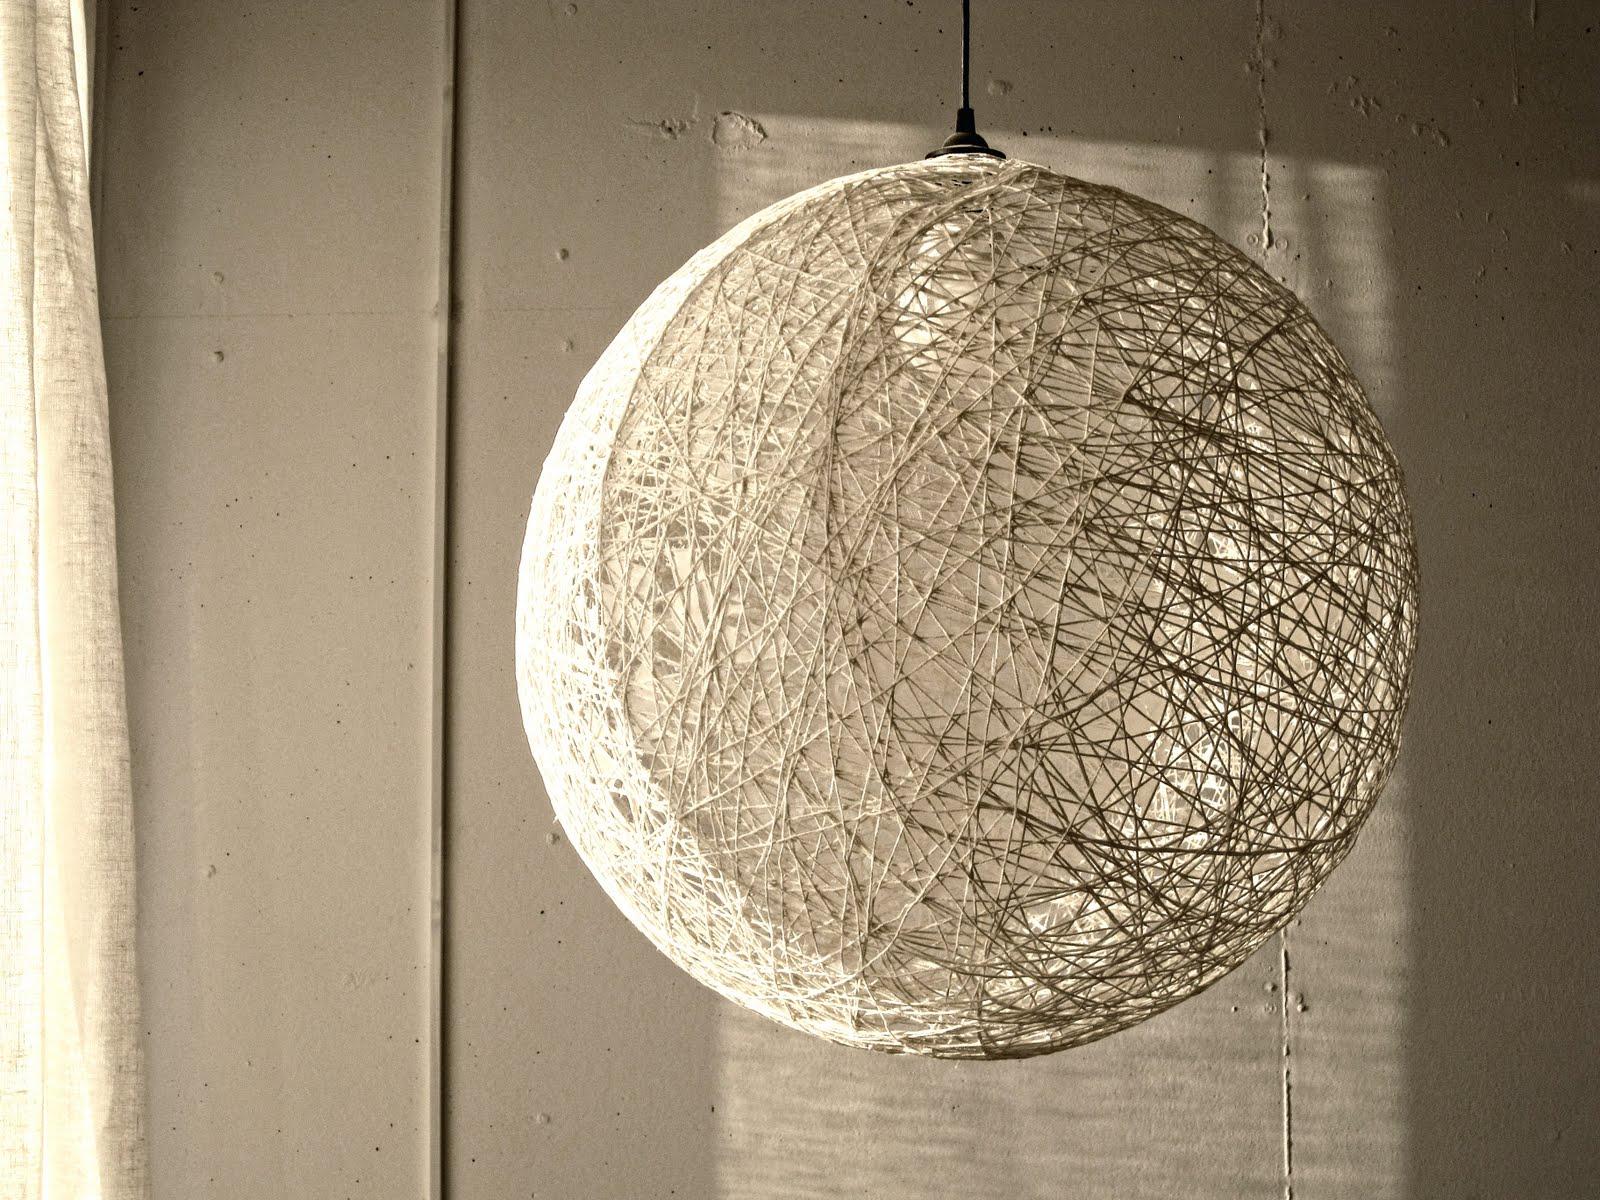 Лампа дома своими руками